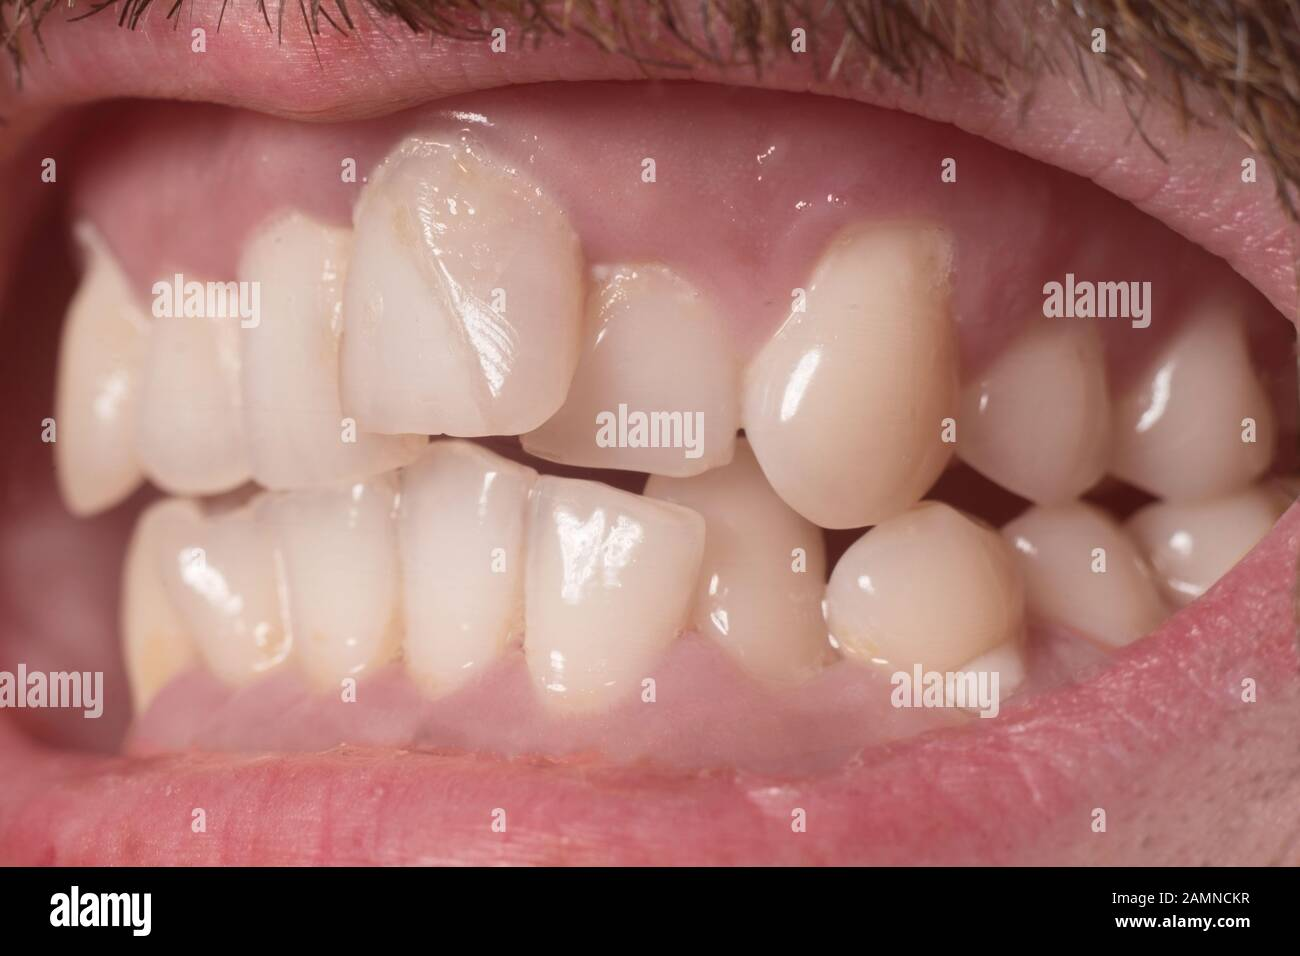 Zähne krumme saubradreti: Krumme